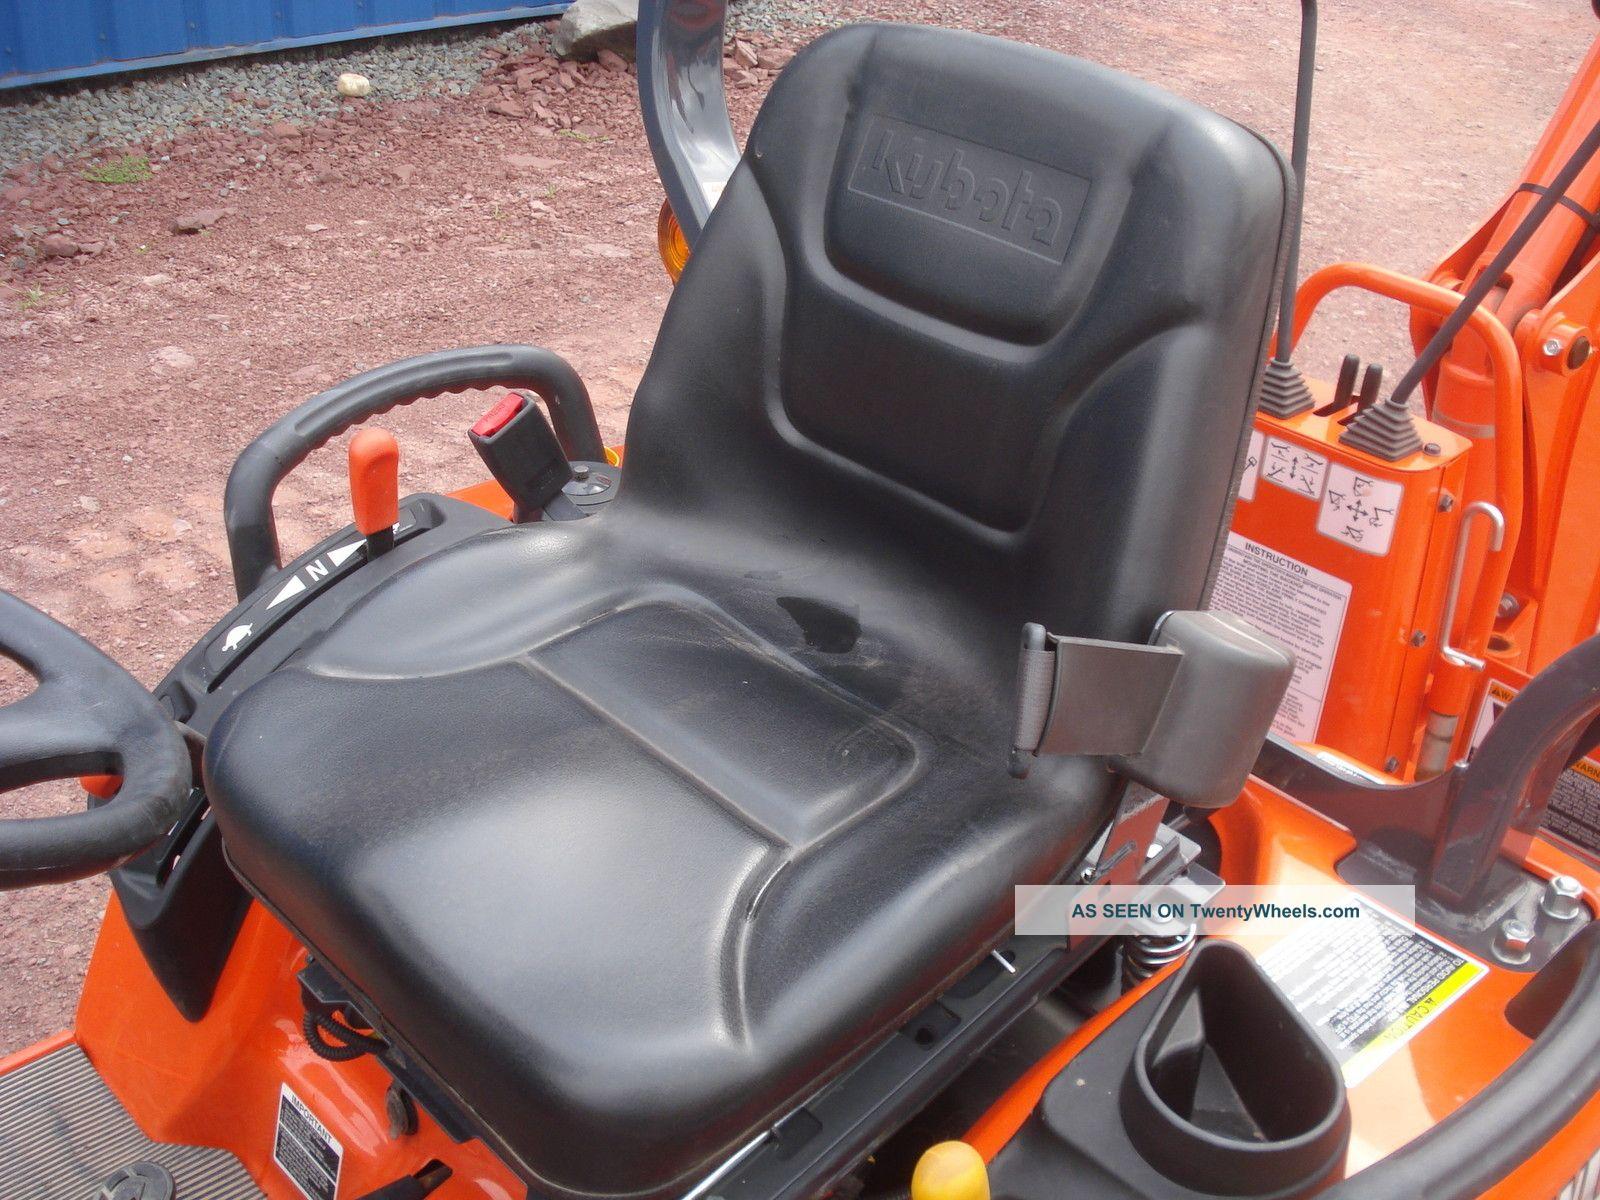 Kubota Bx Tool Box : Kubota bx tractor loader backhoe only hours